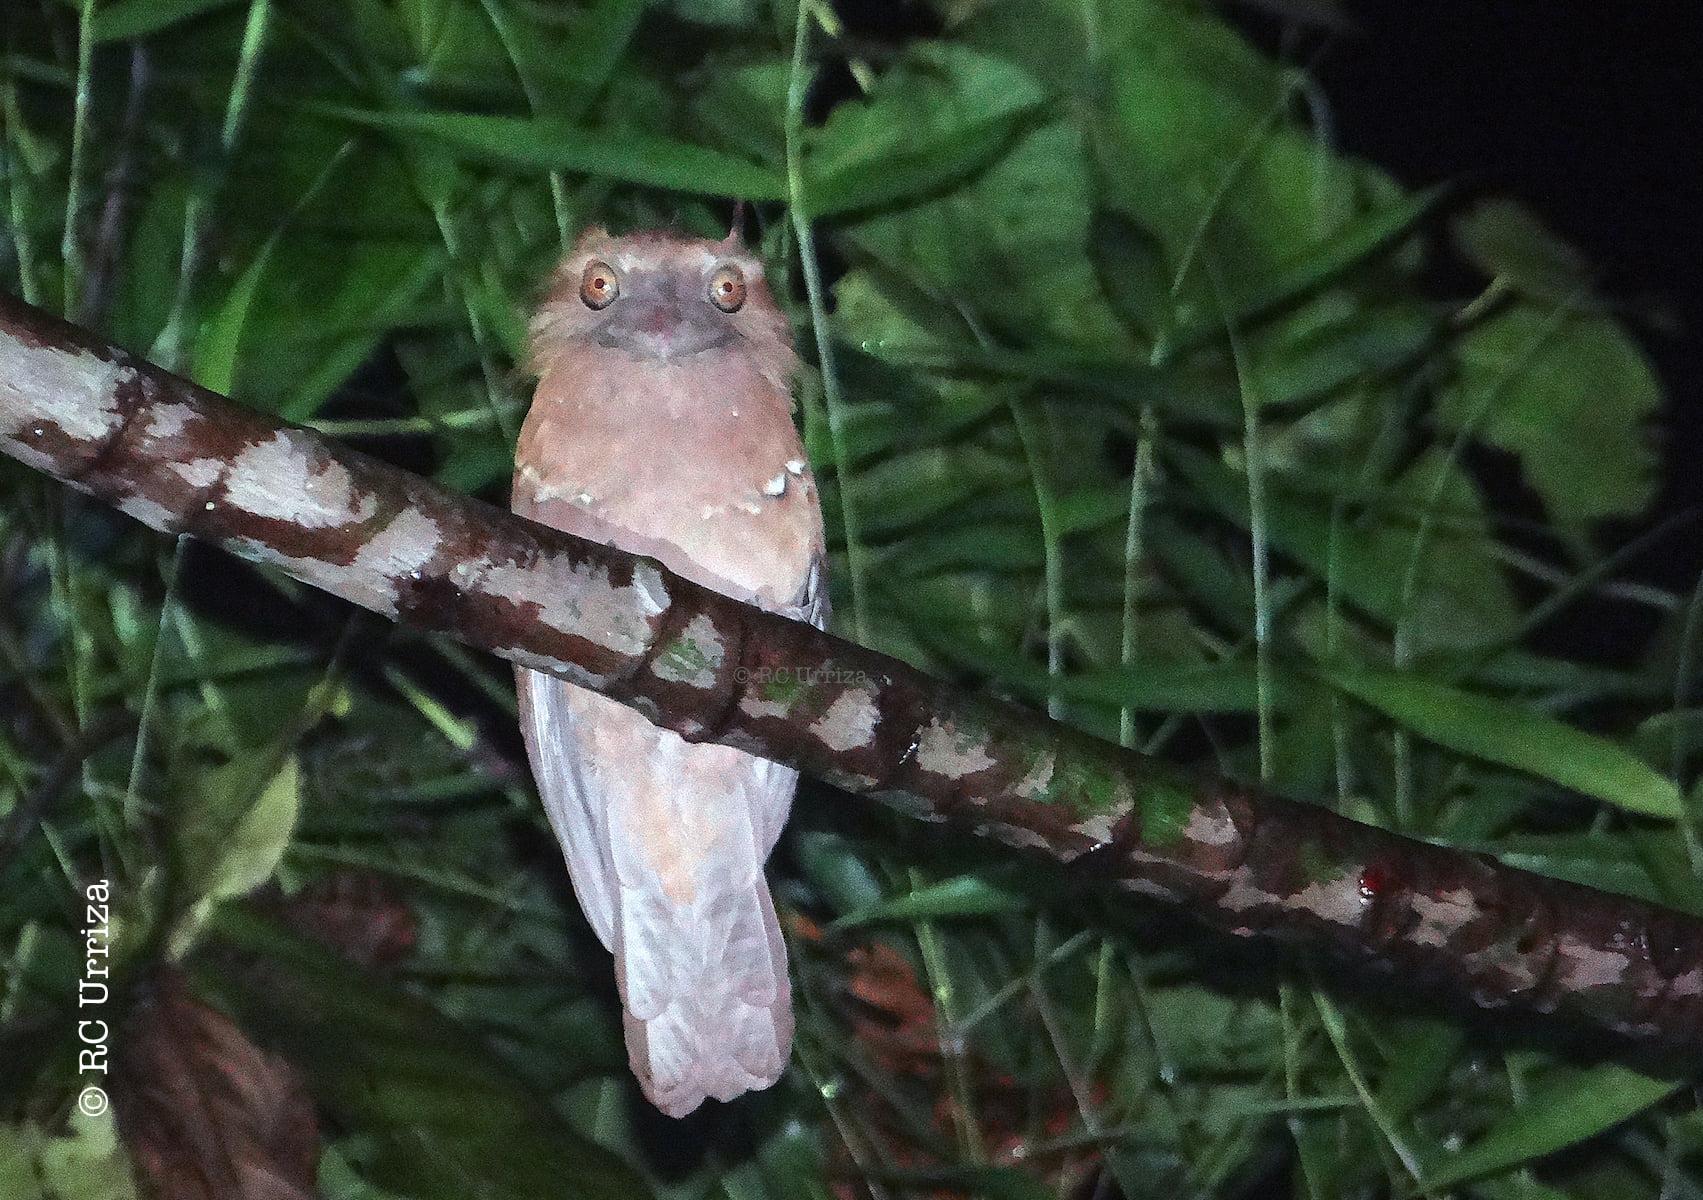 Philippine Frogmouth Batrachostomus septimus microrhynchus